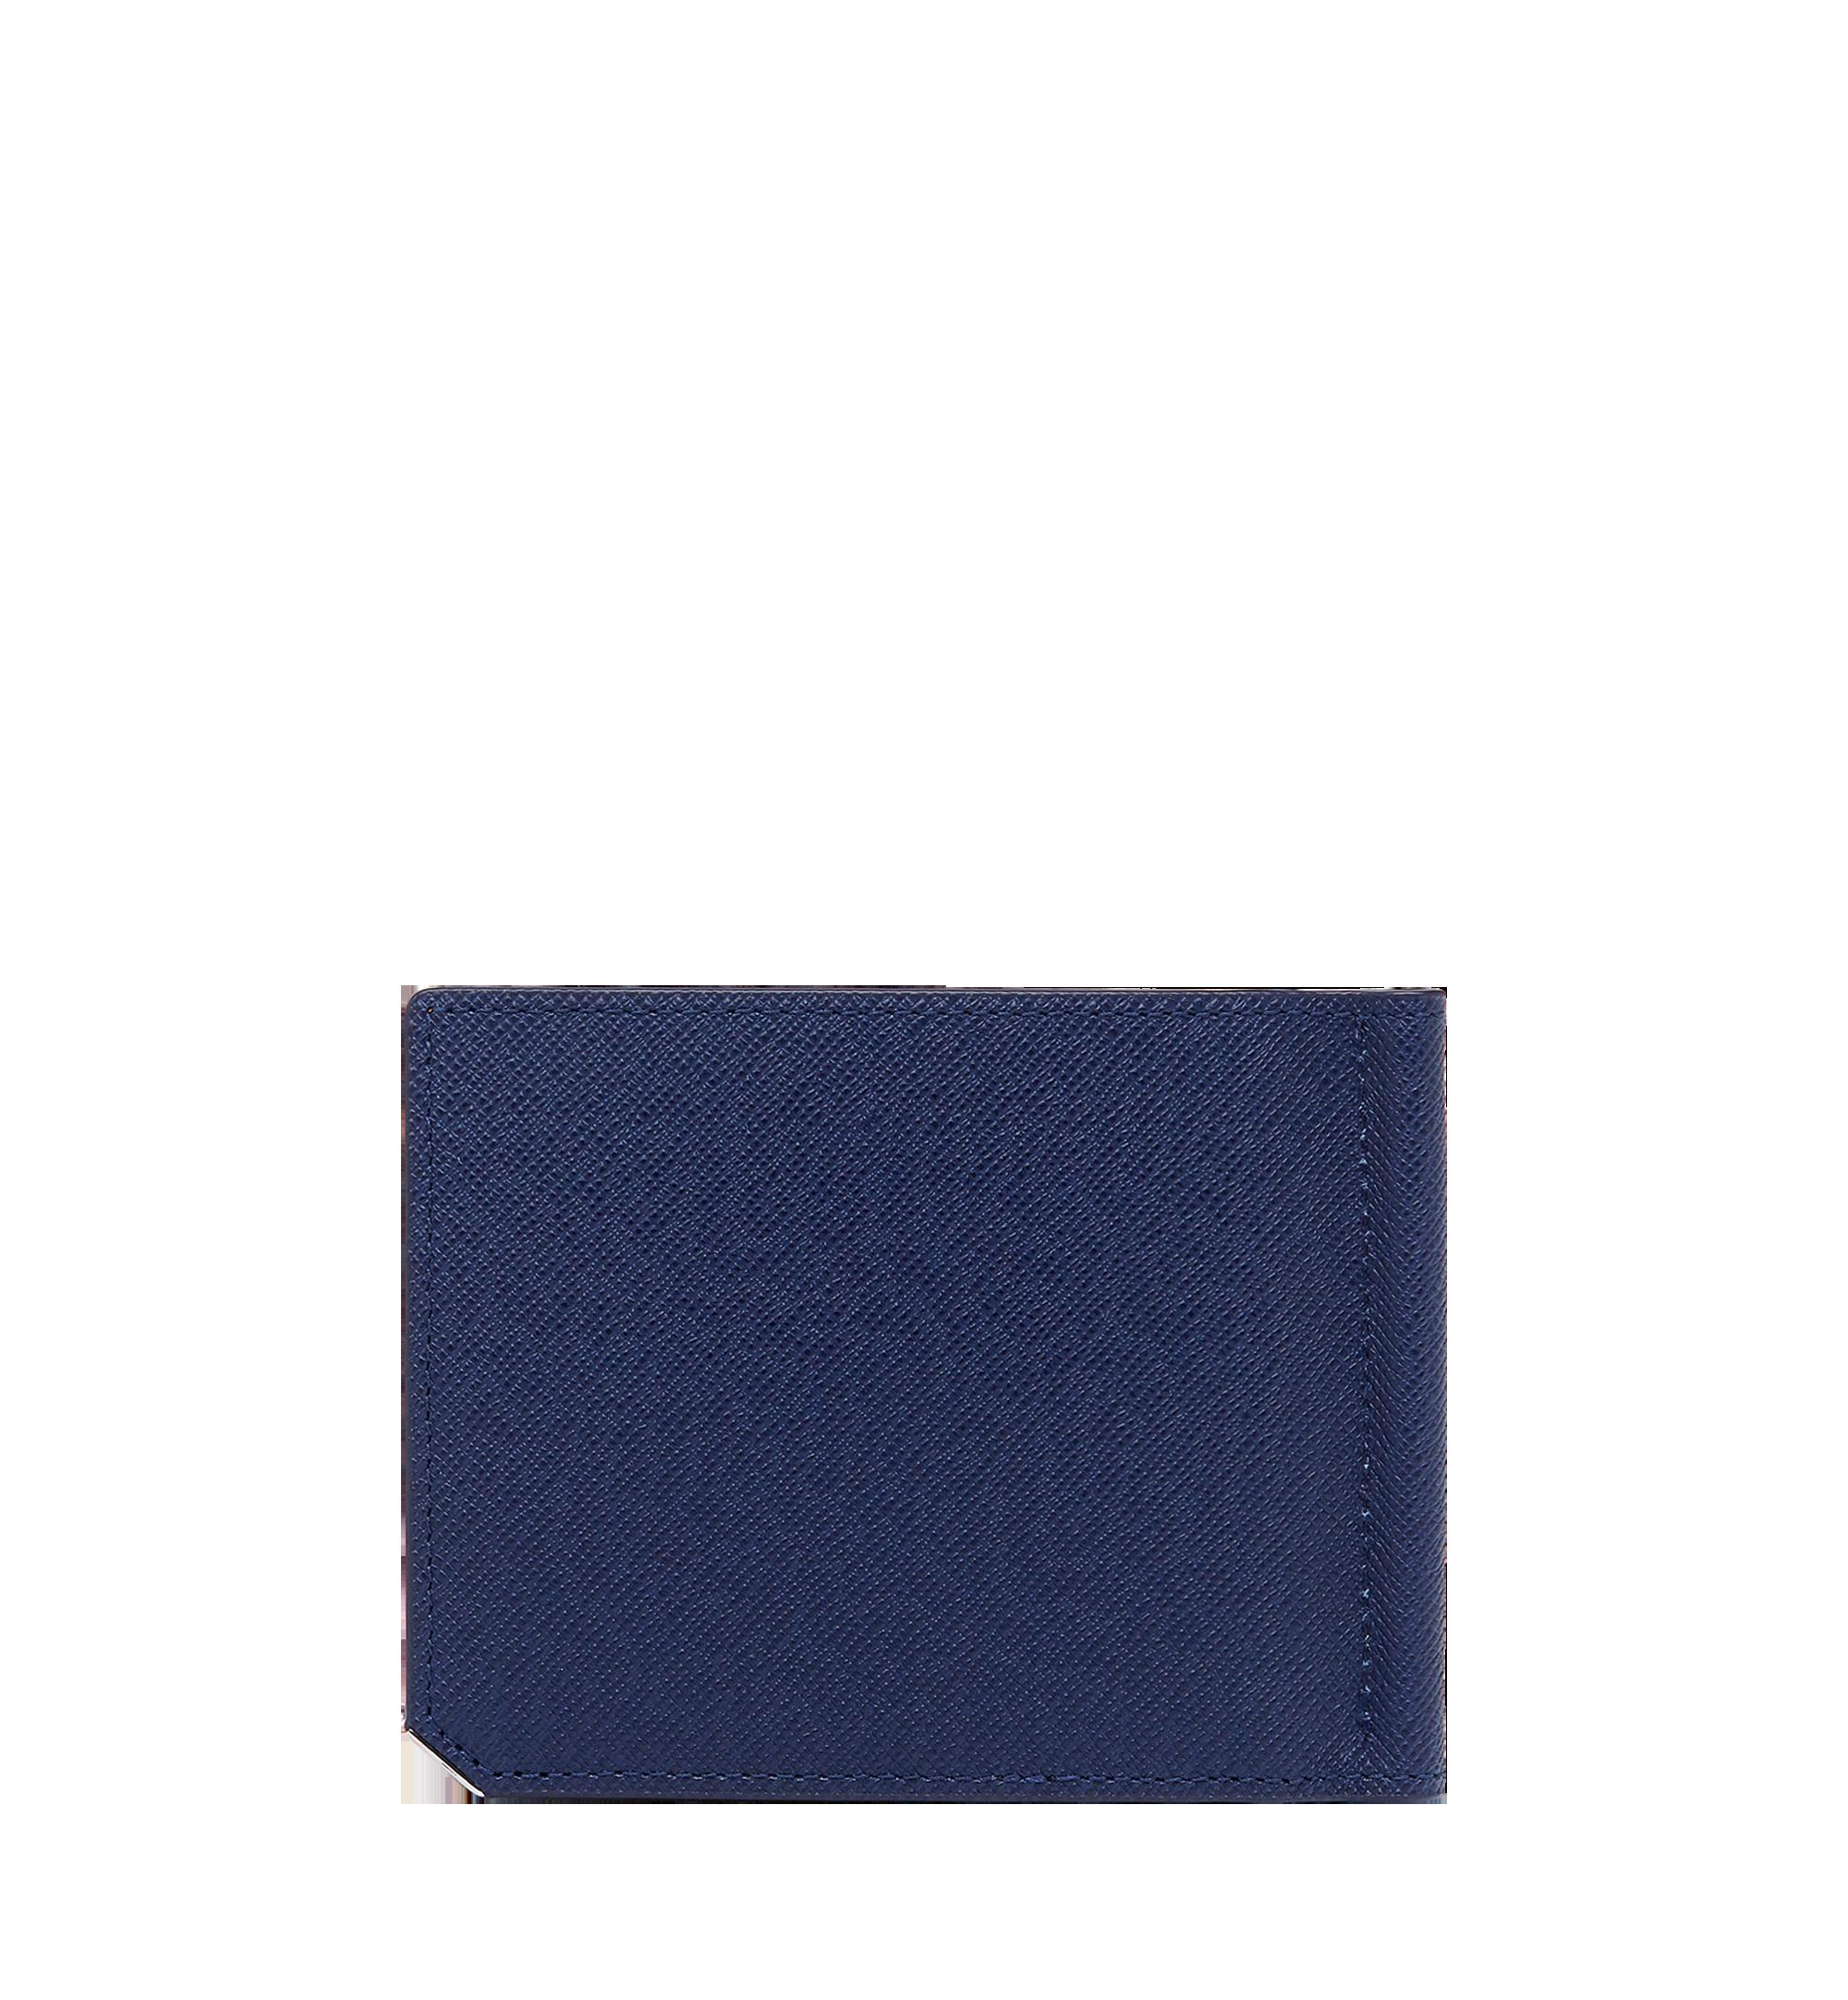 MCM New Bric 經典壓花皮革鈔票夾皮夾 Navy MXC8ALL45VY001 更多視圖 2